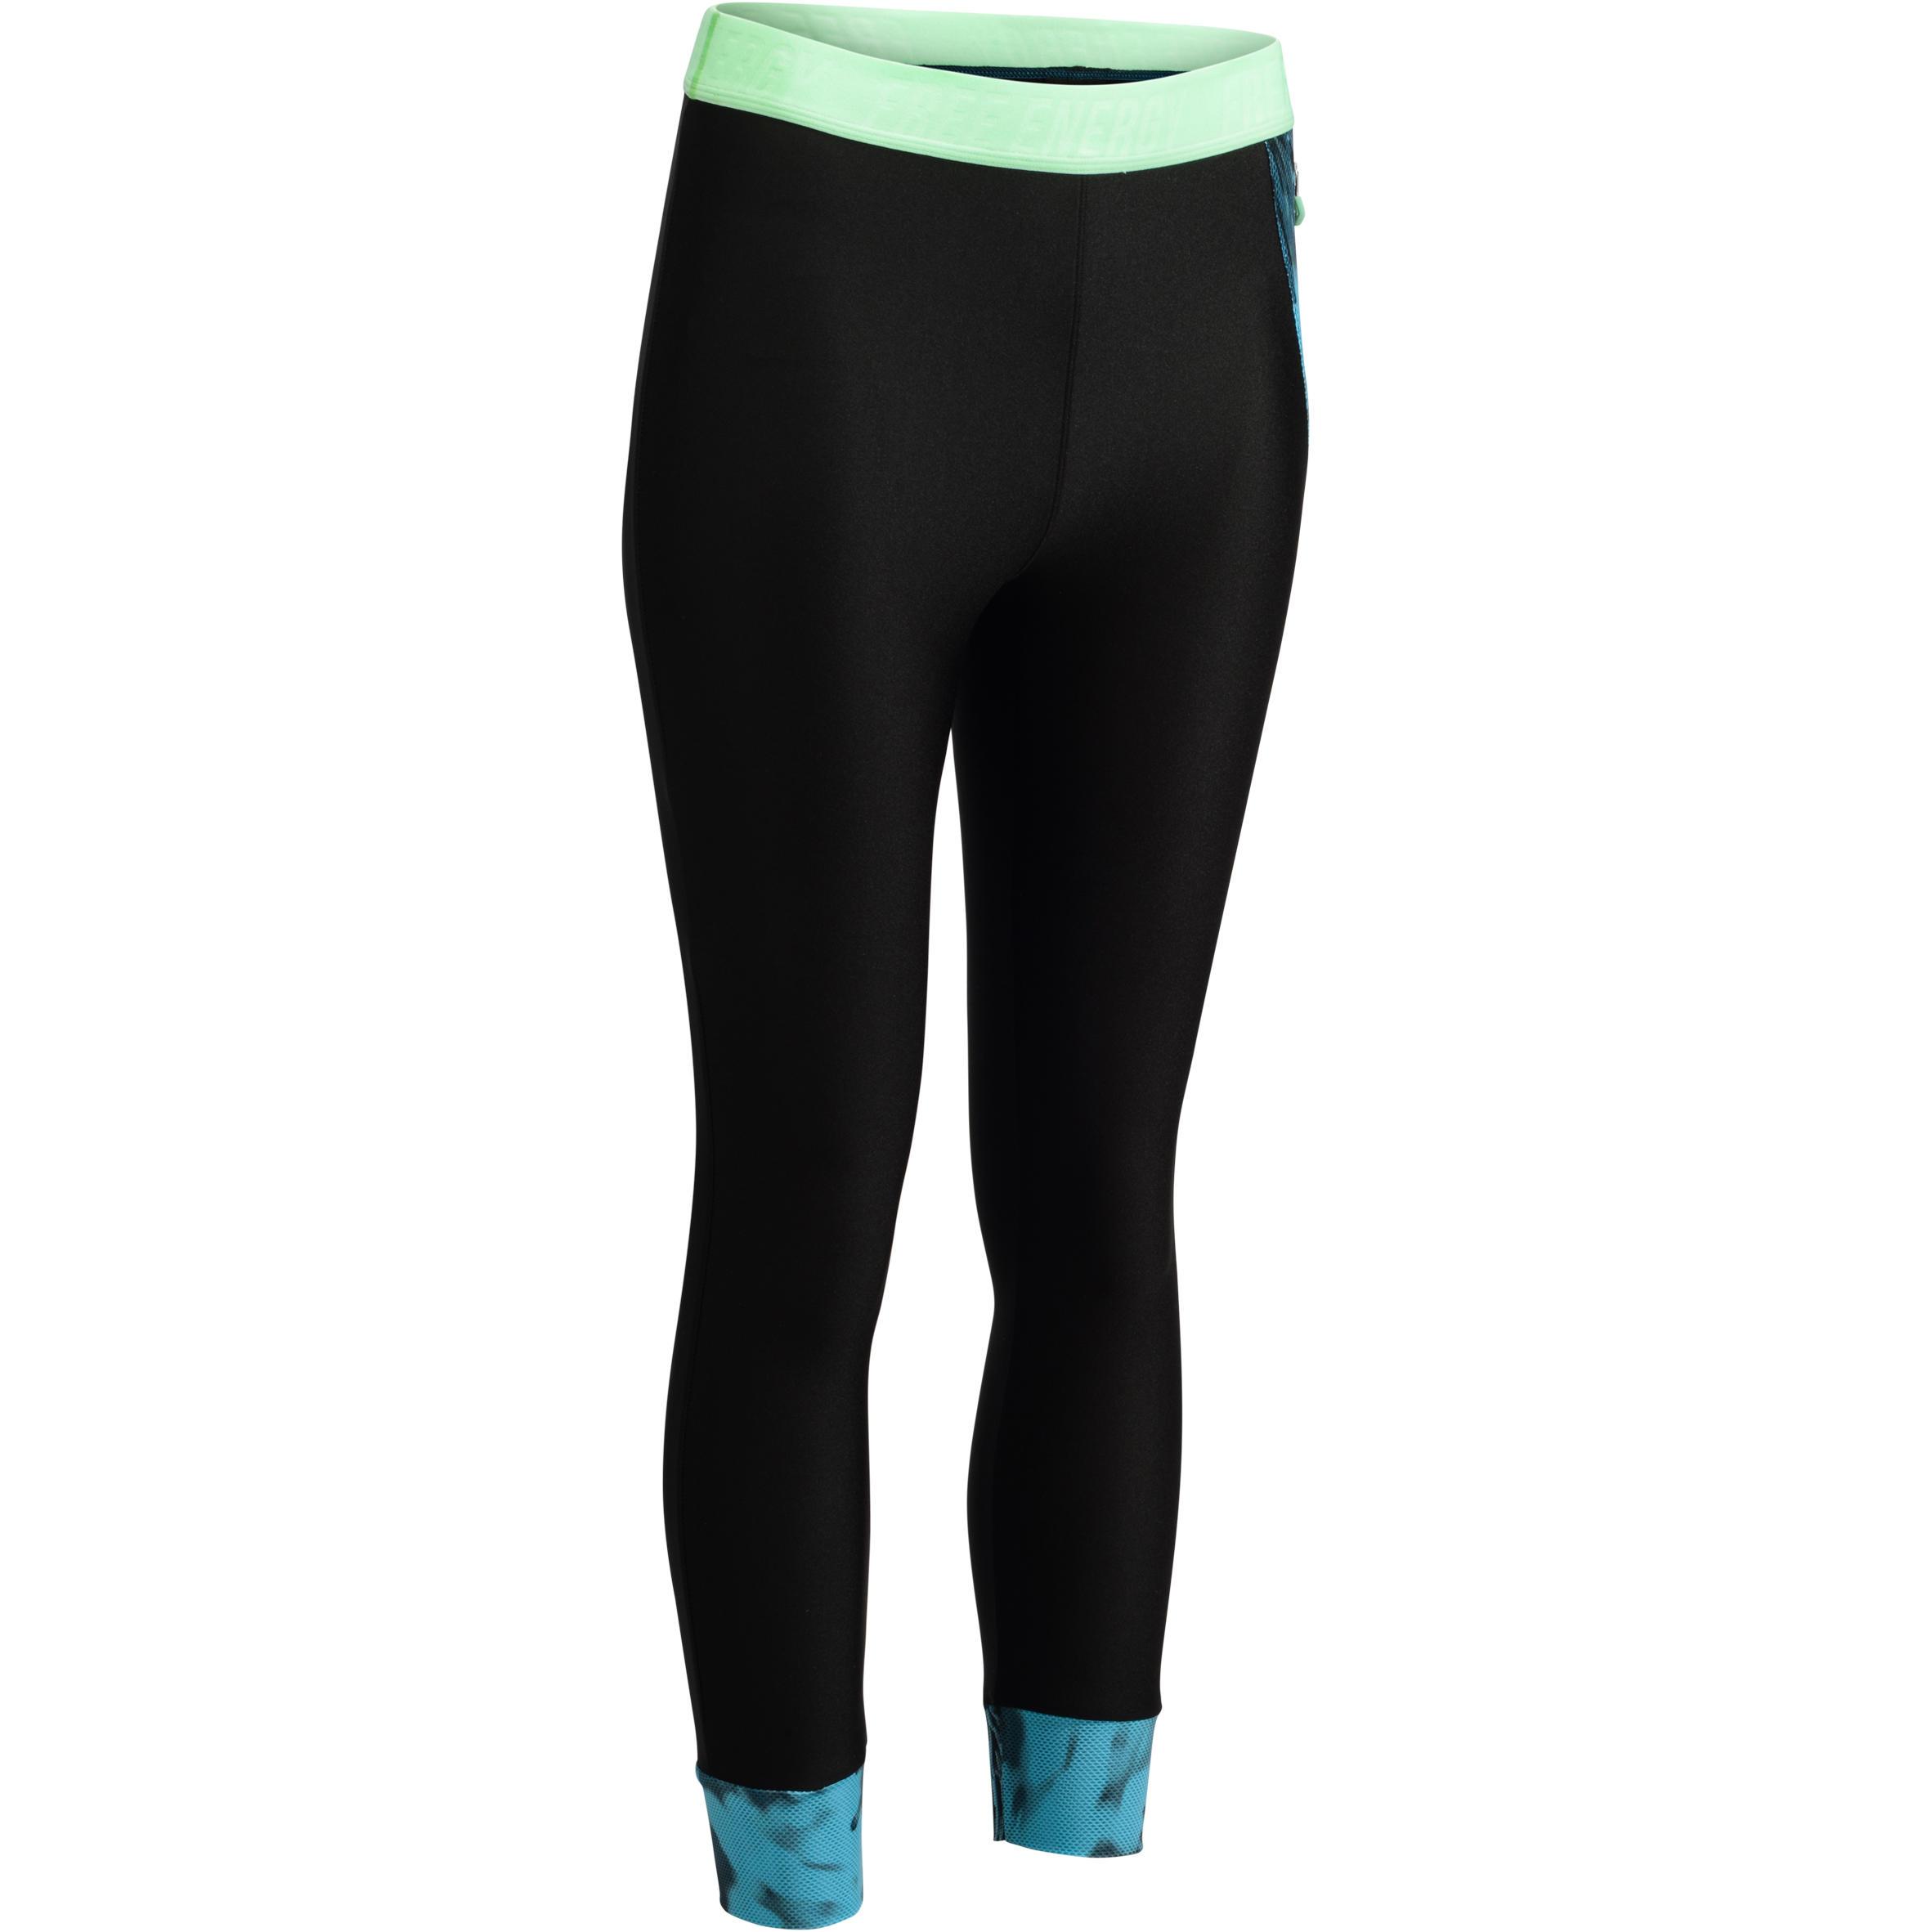 500 Women's Cardio Fitness 7/8 Leggings - Black/Tropical Details